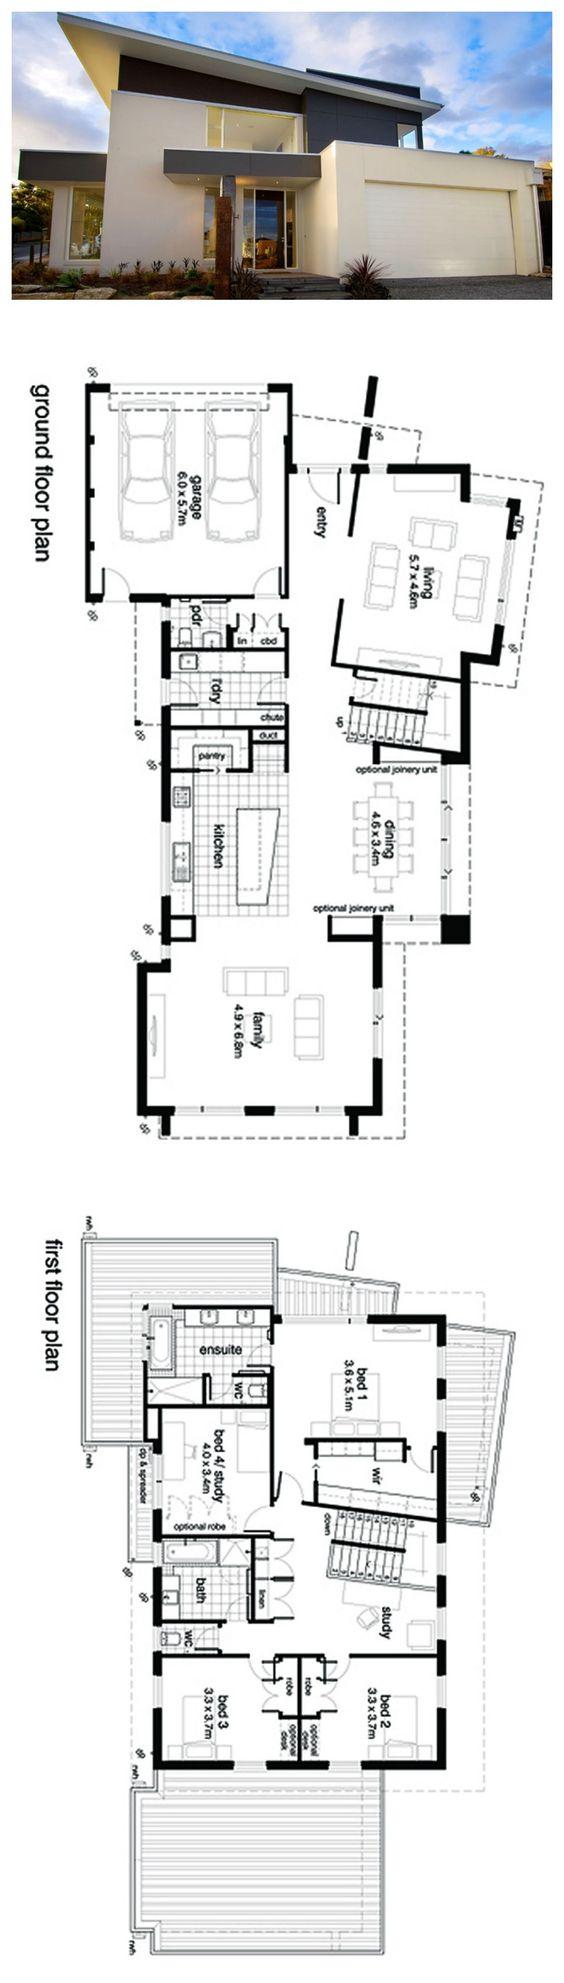 Plan #496-19 | 3146 SF | 4 Bed | 2.5 Bath | 2 Car | 2 Story